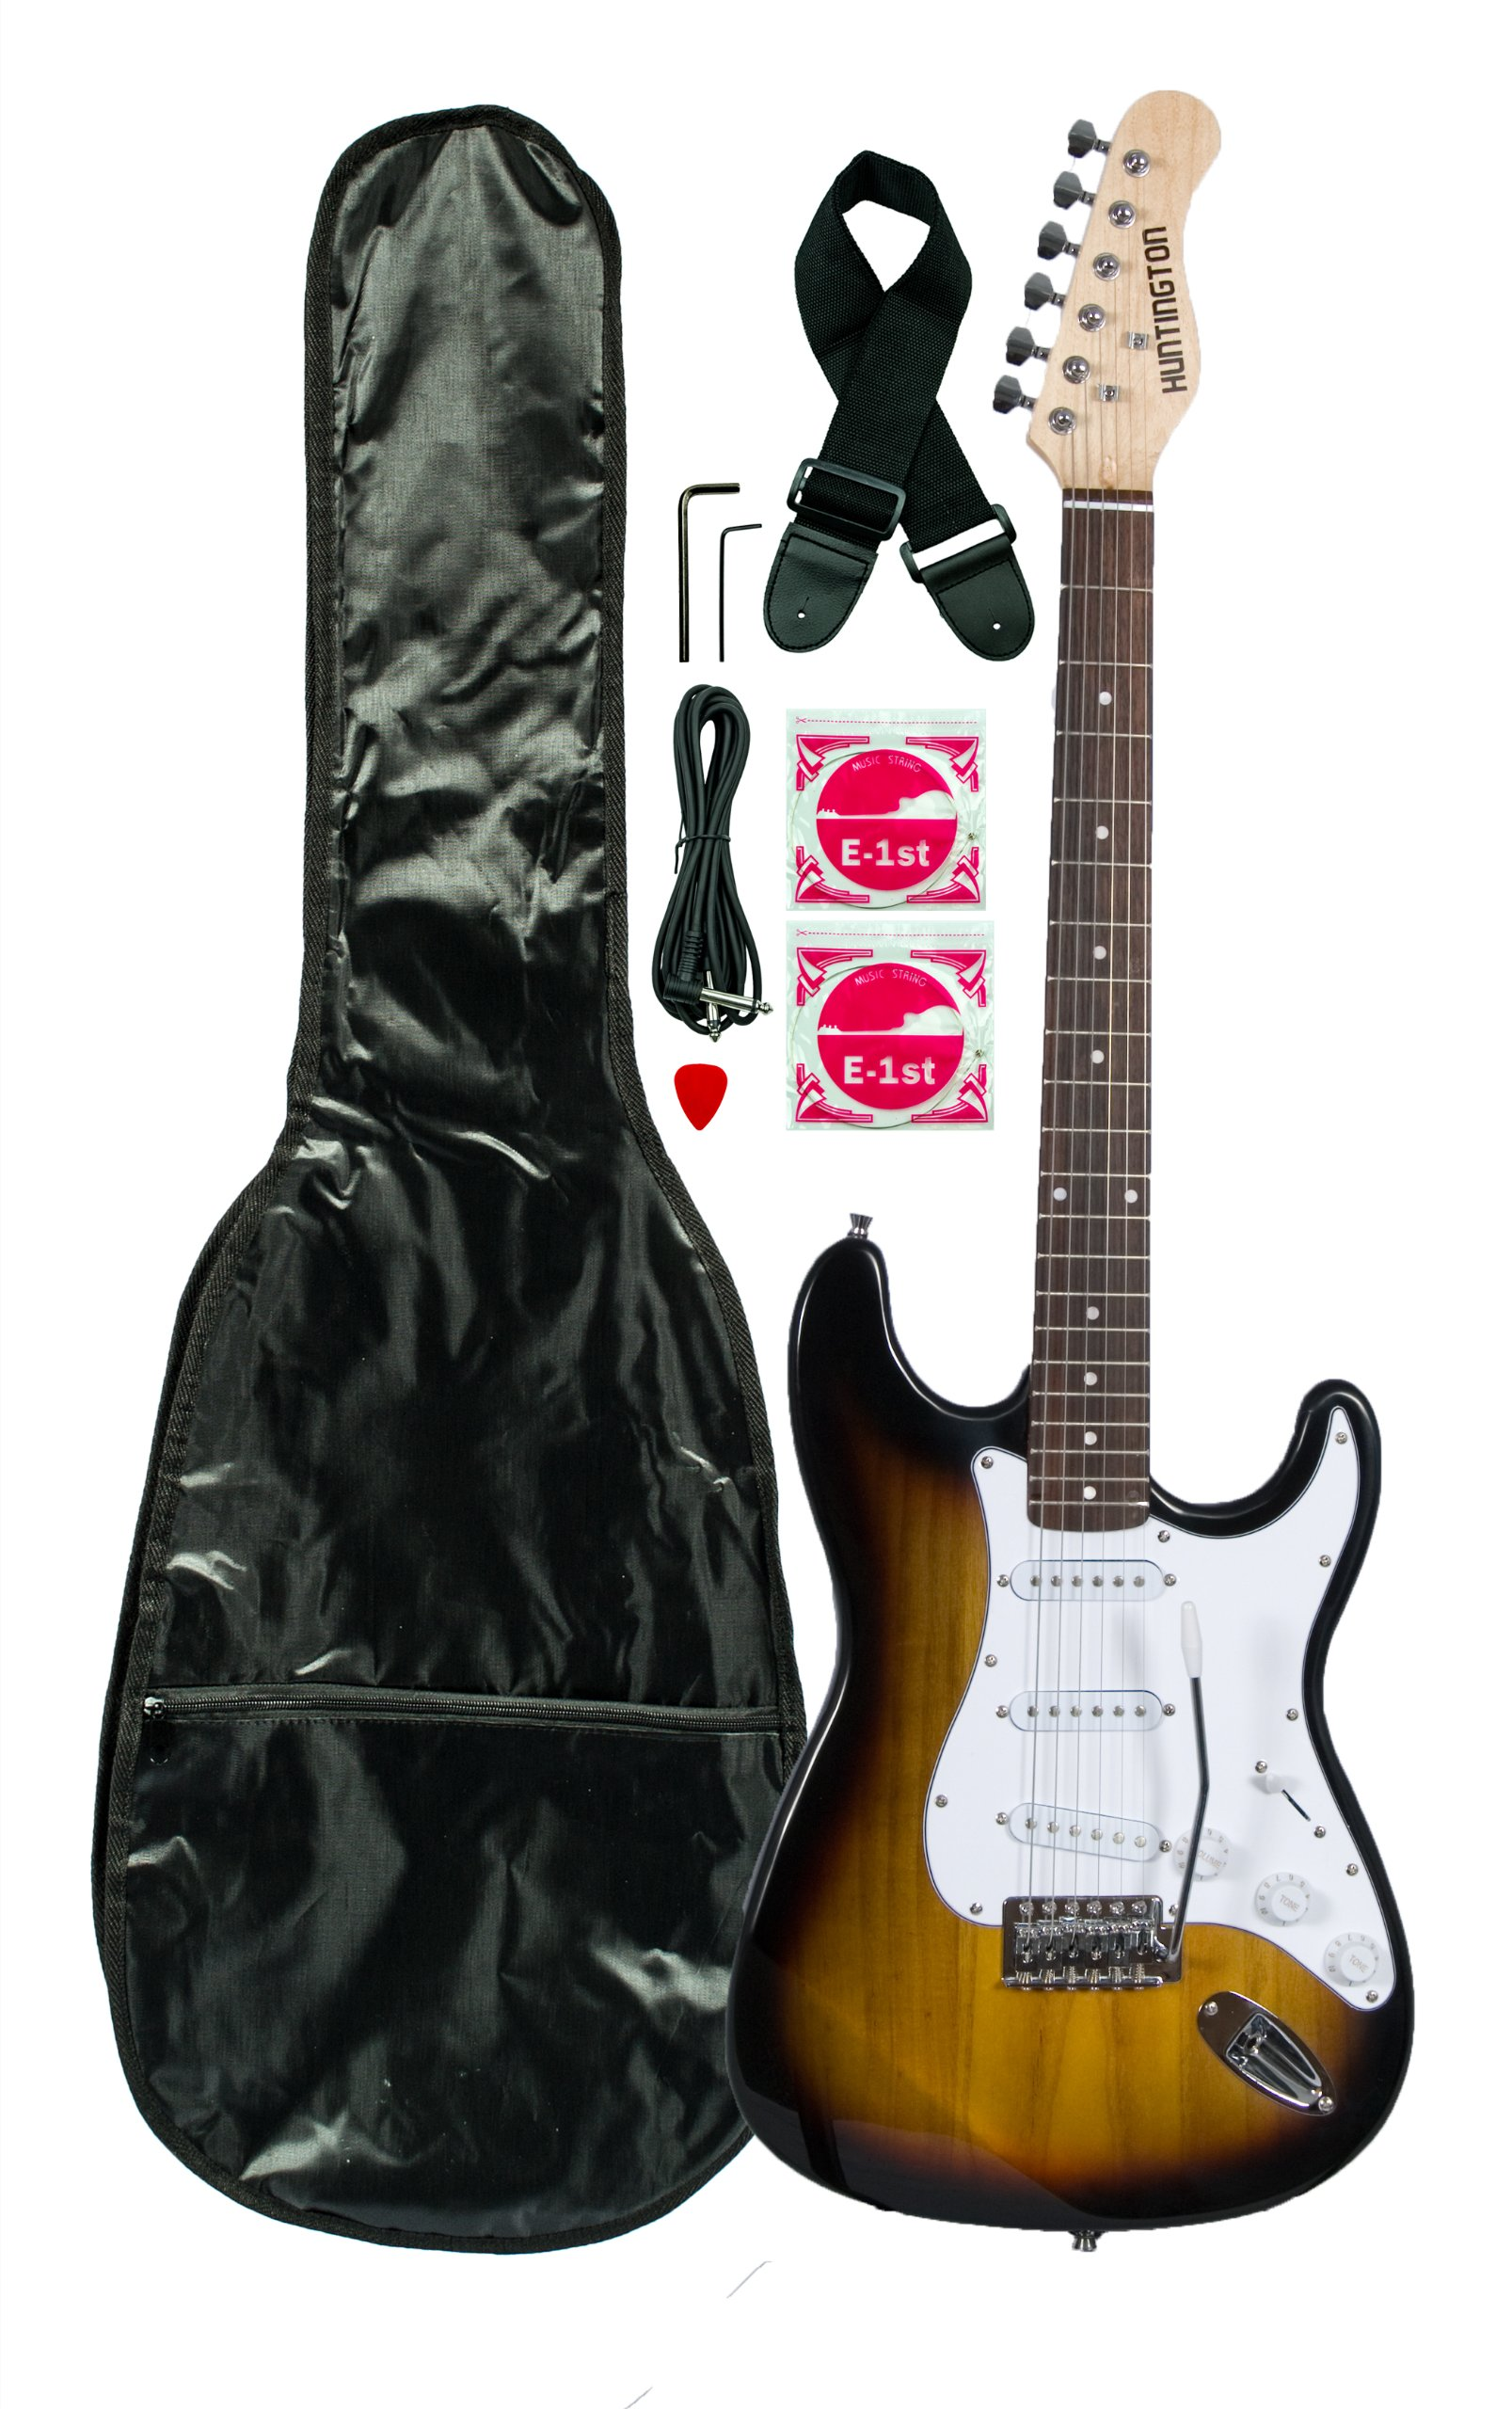 Cheap Huntington GE139-TS Electric Guitar Pack Tobacco Sunburst Black Friday & Cyber Monday 2019